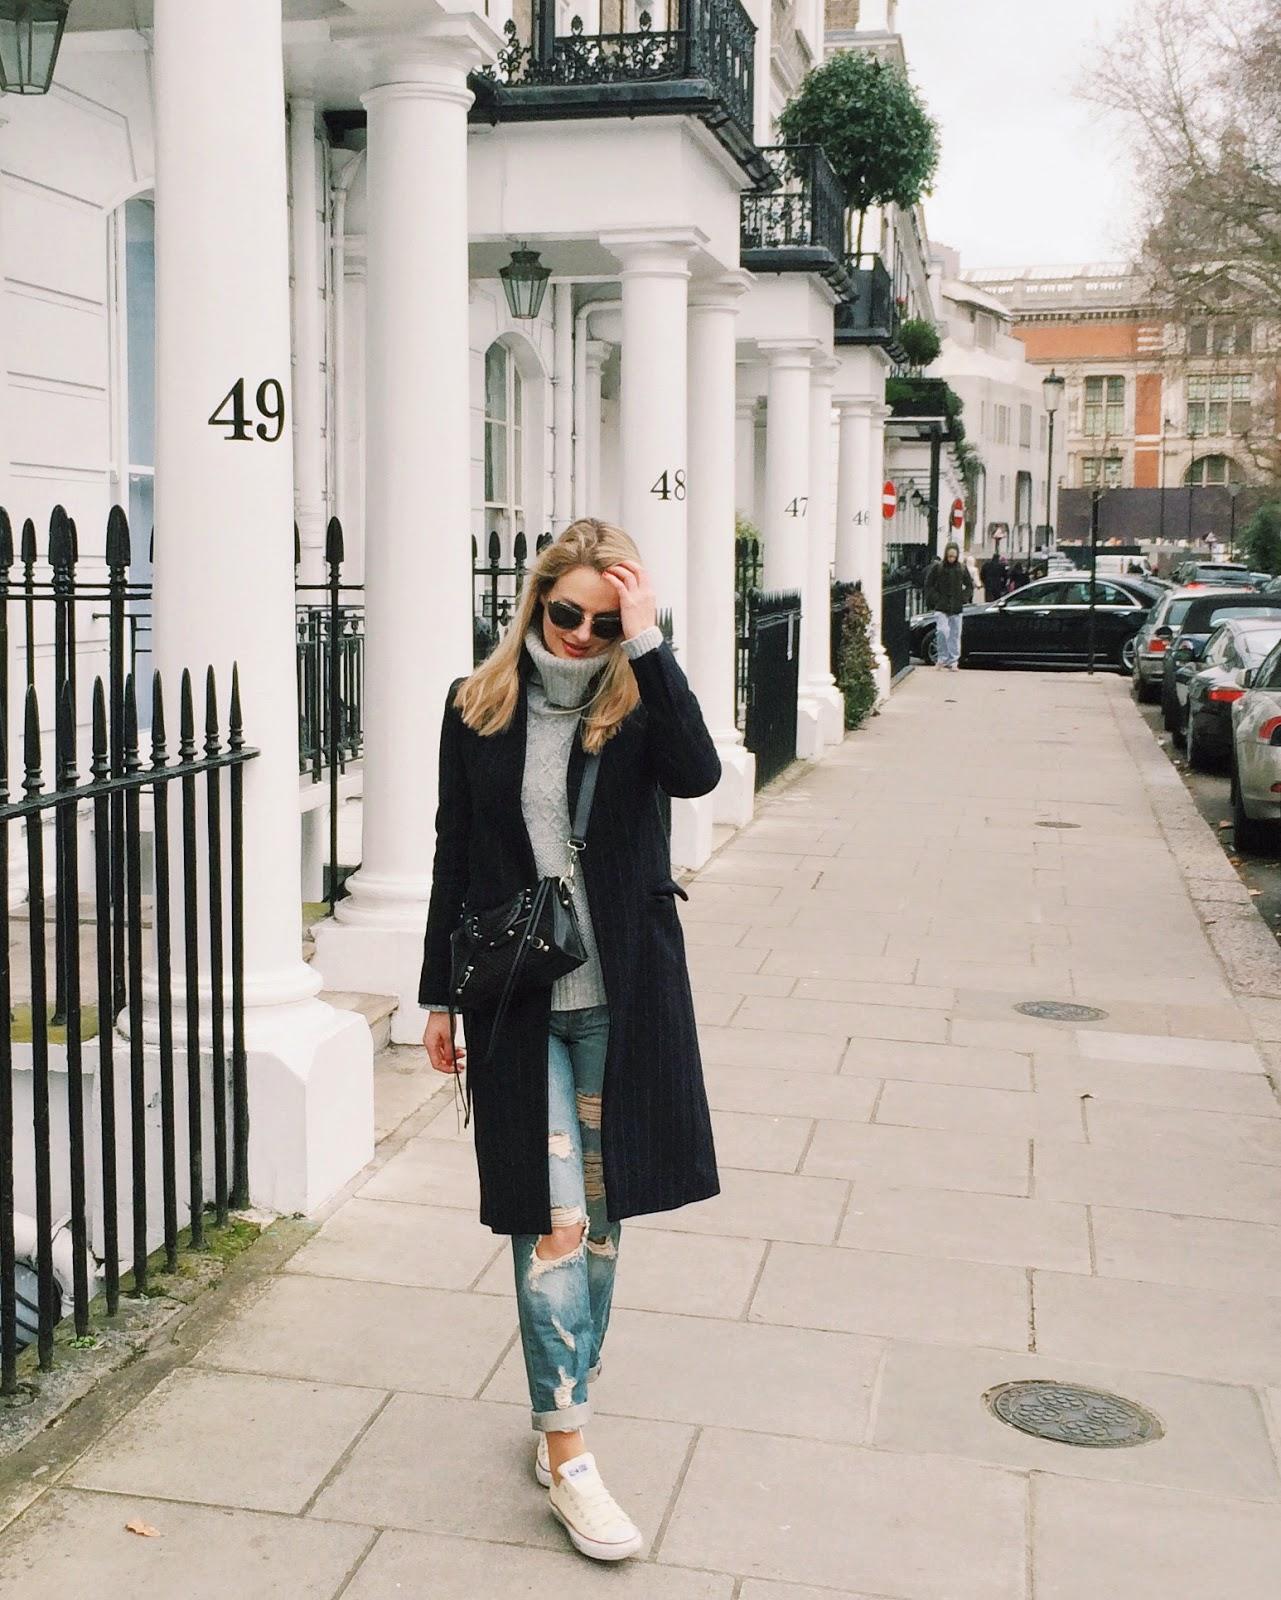 Streetstyle london, london blogger, pinstriped coat, boyfriend jeans, boyfriend jeans ripped, asos boyfriend jeans, white converse and boyfriend jeans, balenciaga shoulder bag, black balenciaga mini city, miu miu glitter sunglasses, grey turtleneck jumper